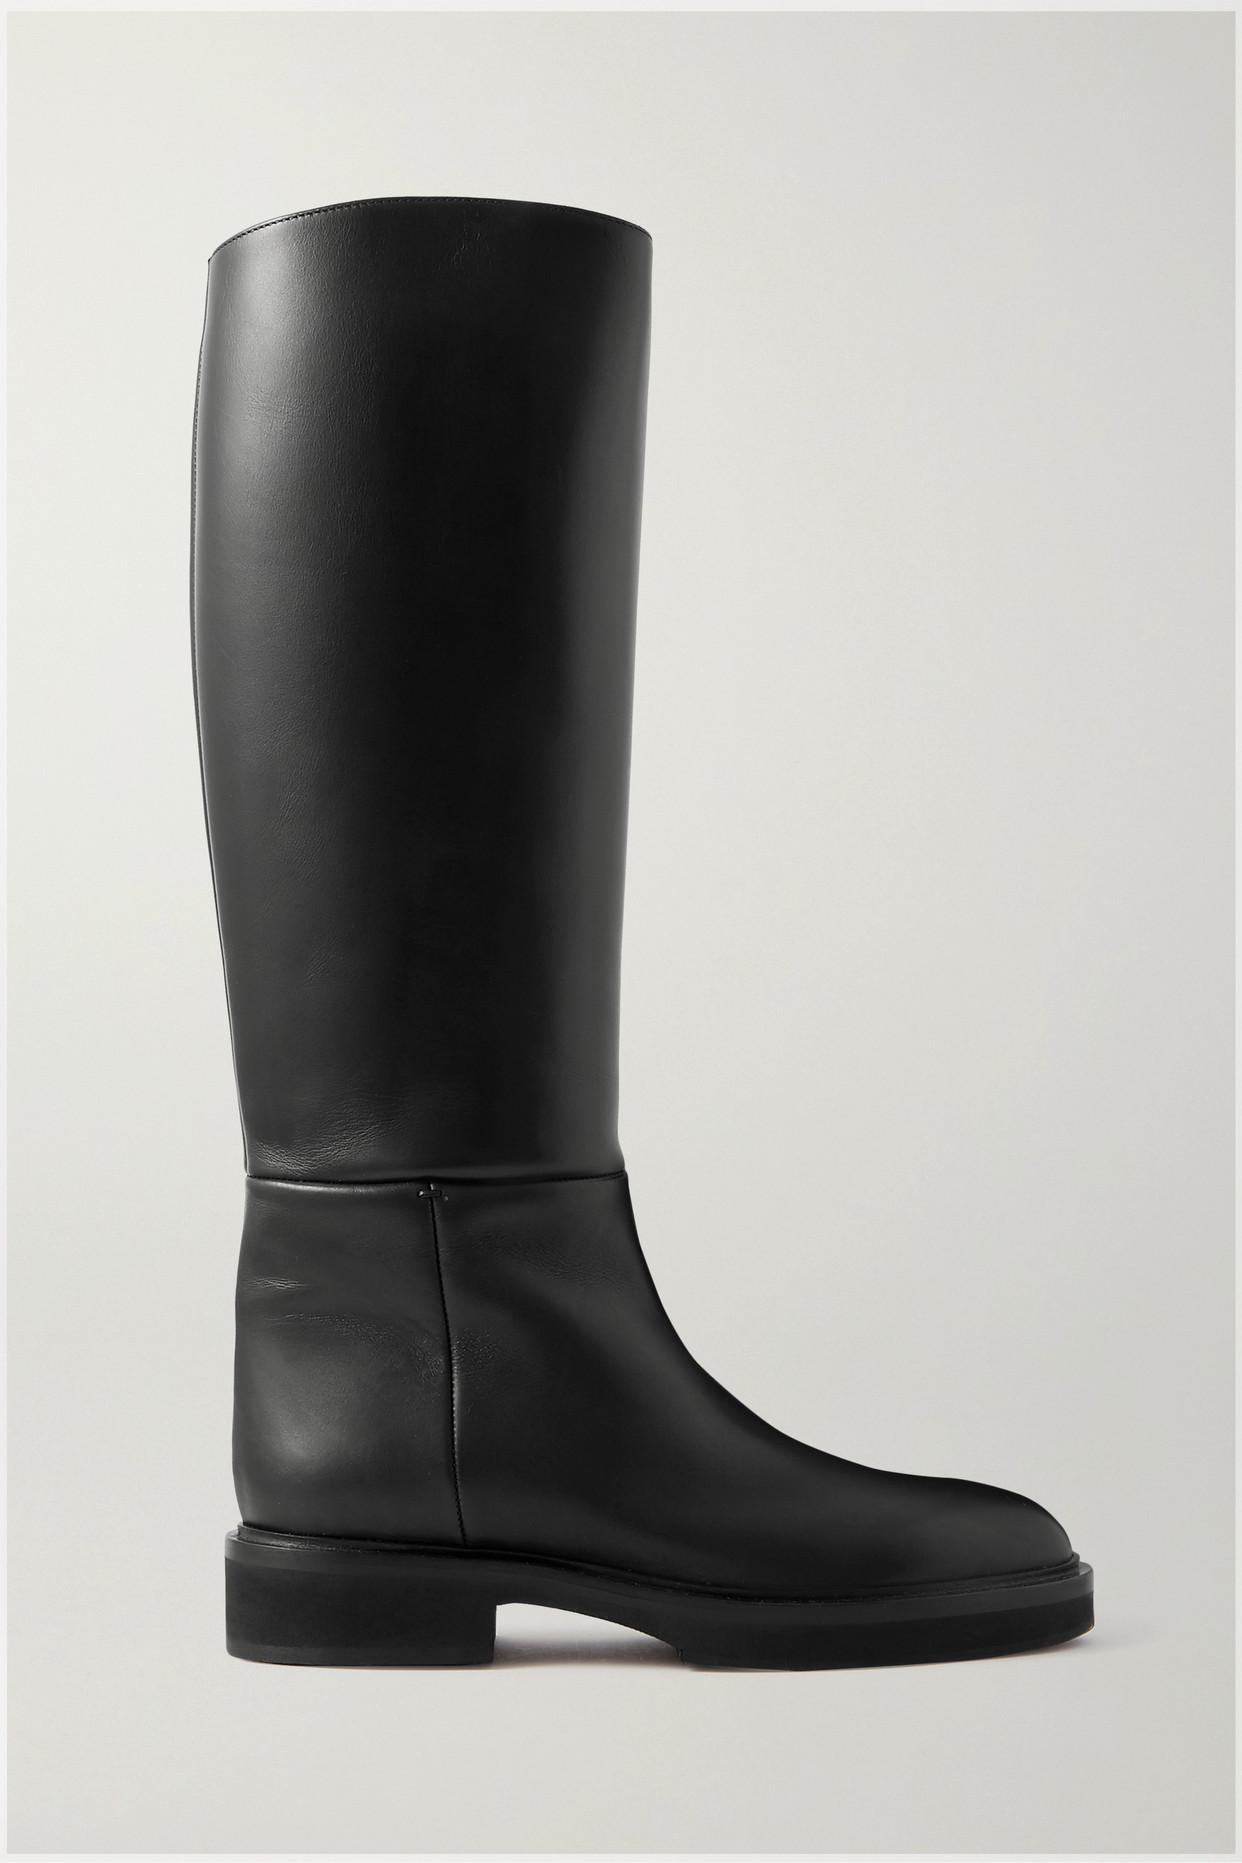 KHAITE - Derby 皮革及膝长靴 - 黑色 - IT37.5